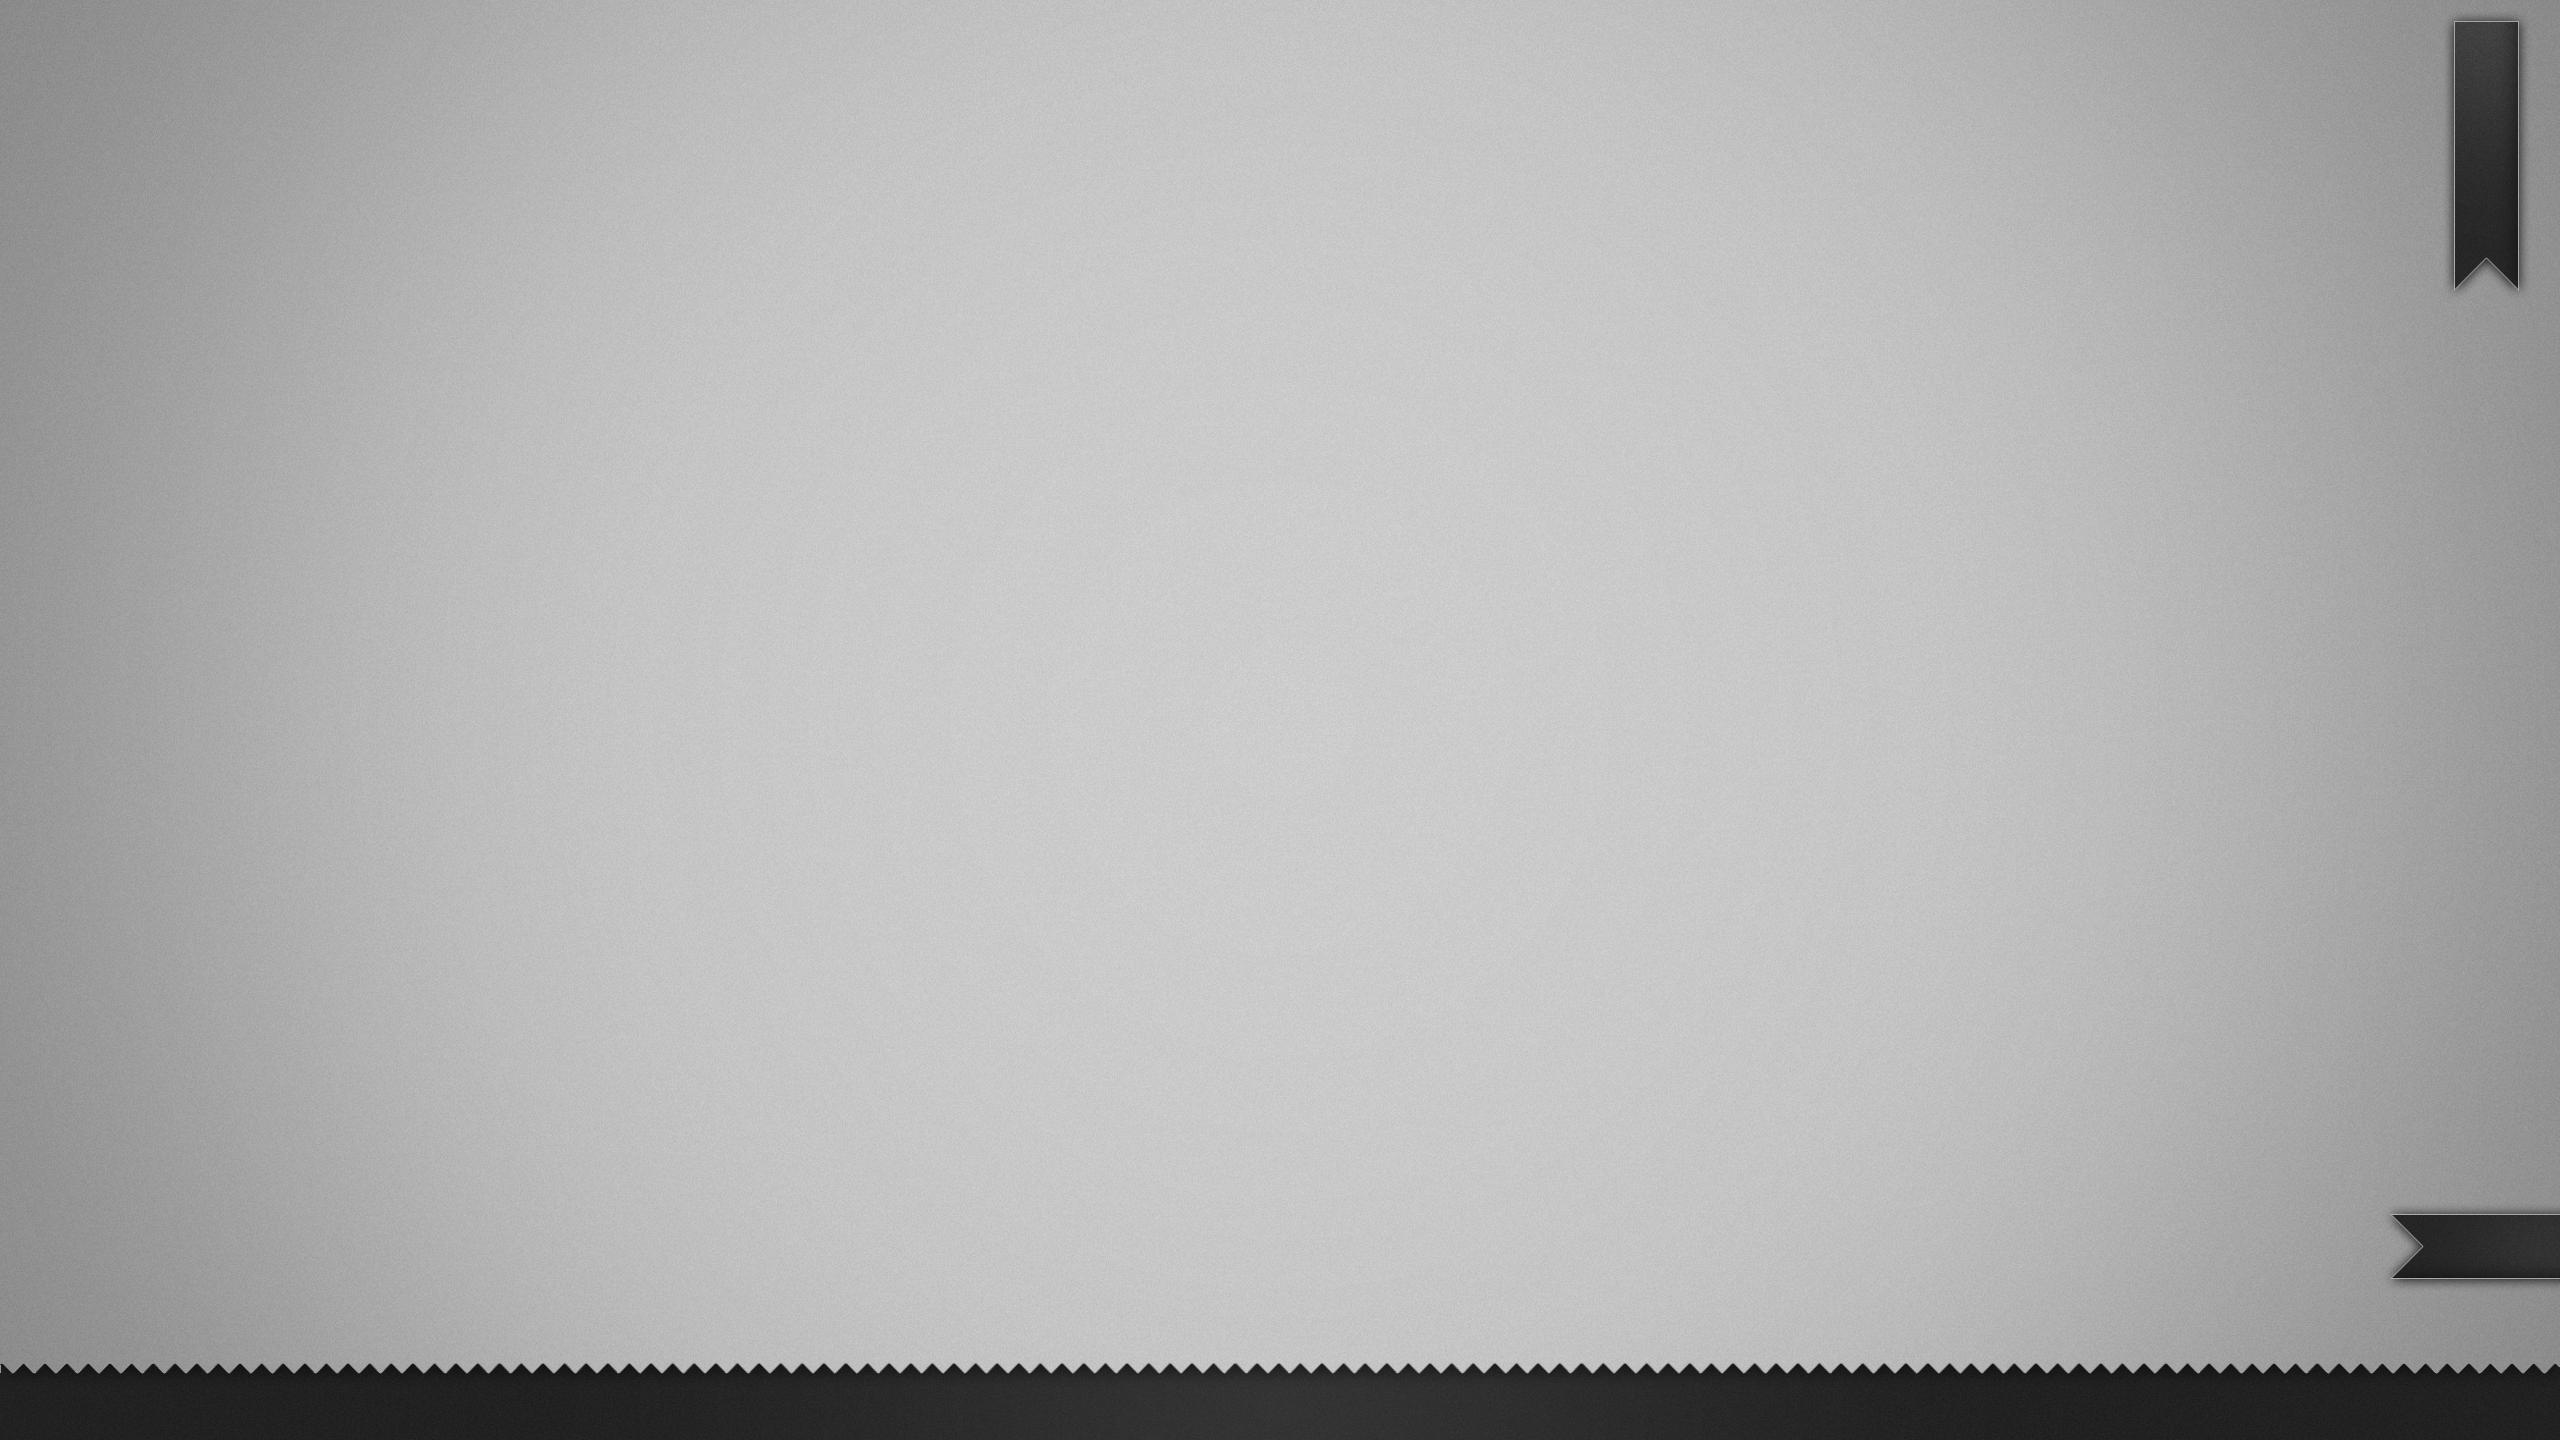 Minimal wallpaper desktop minimalist images   1102664 2560x1440